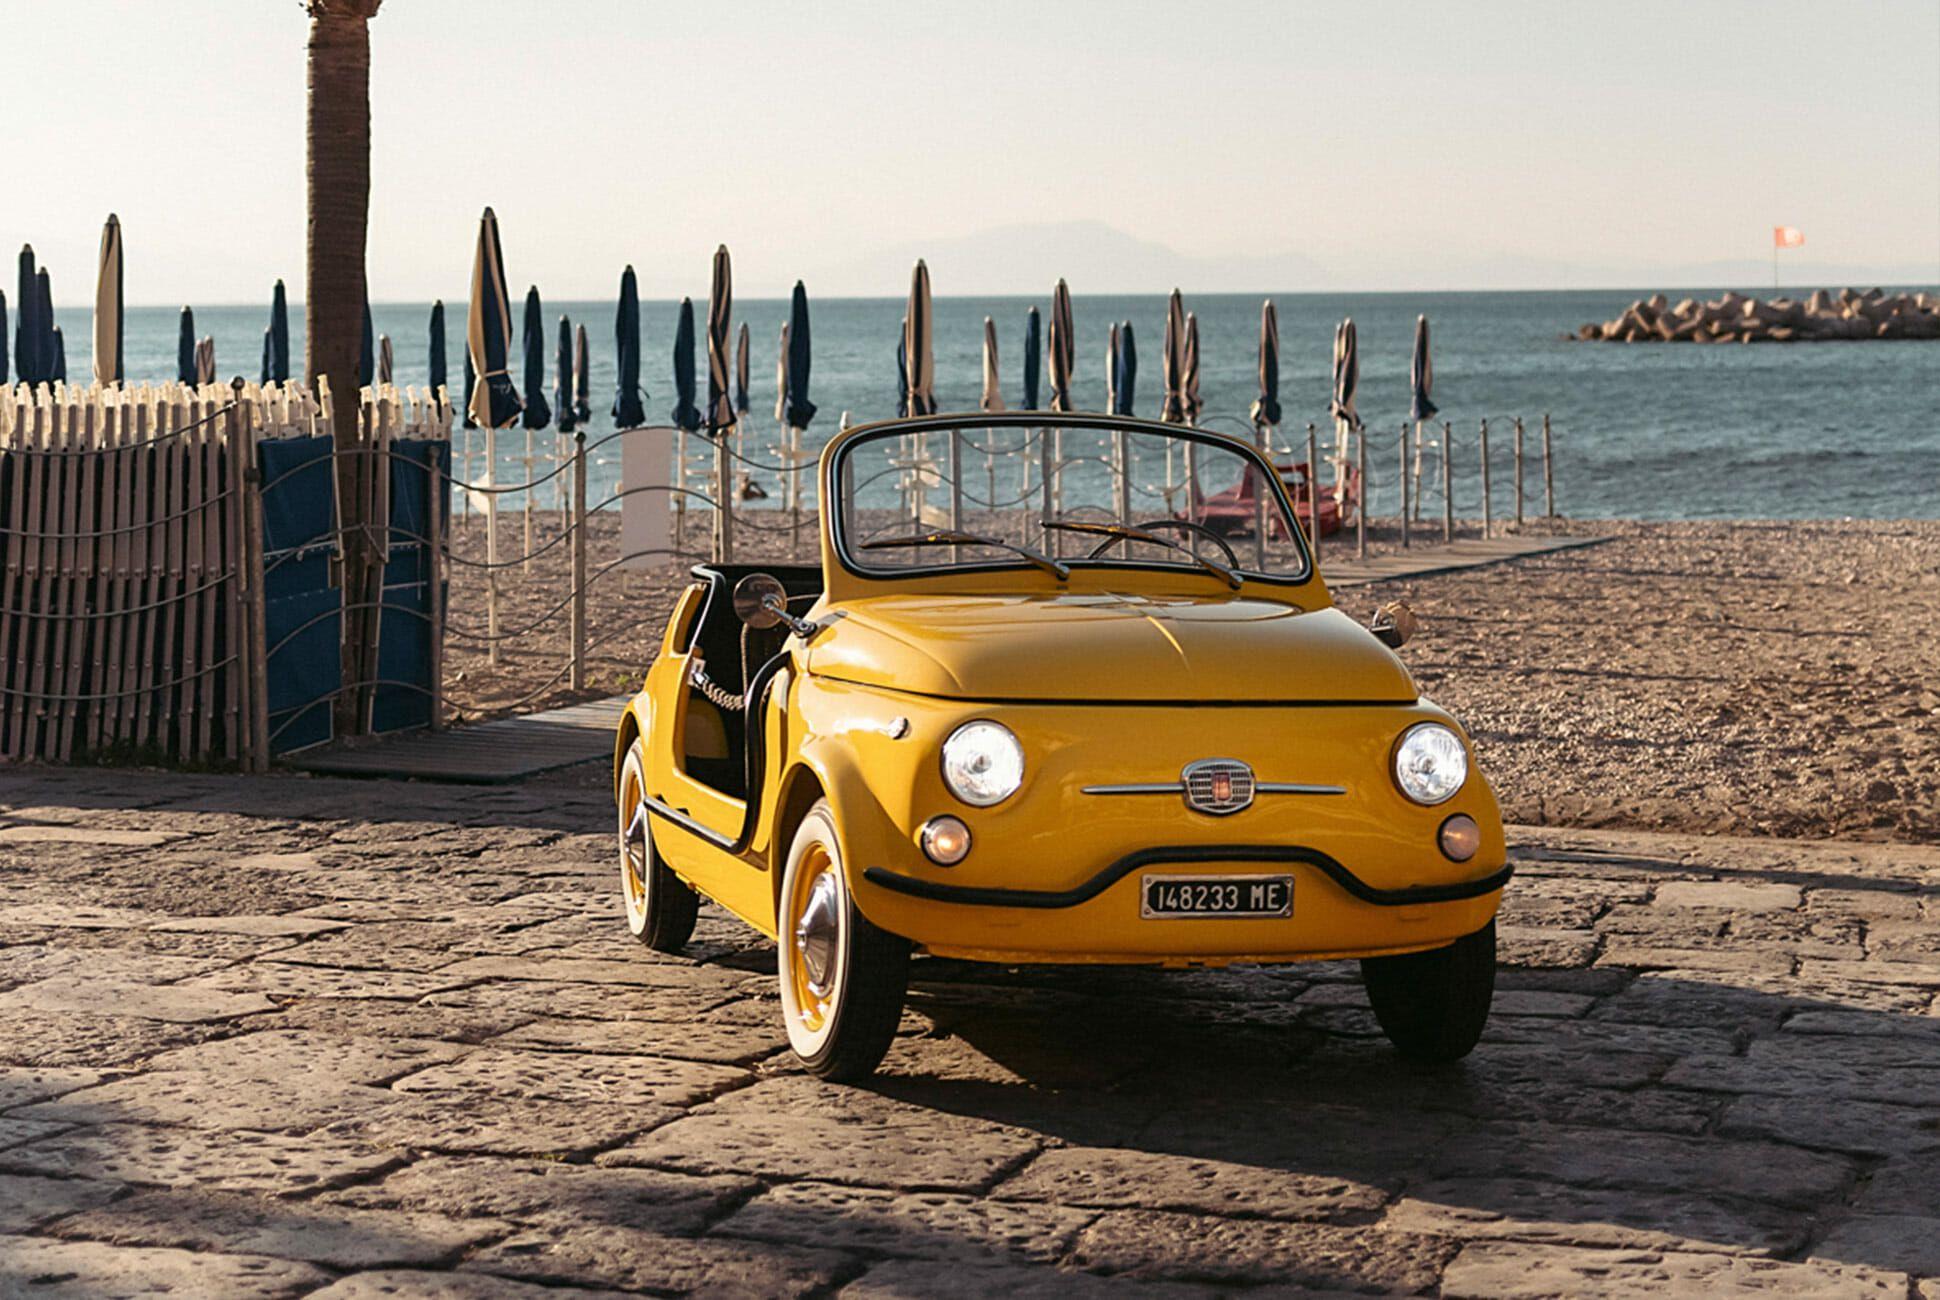 Fiat-Electric-Vehicles-gear-patrol-slide-1